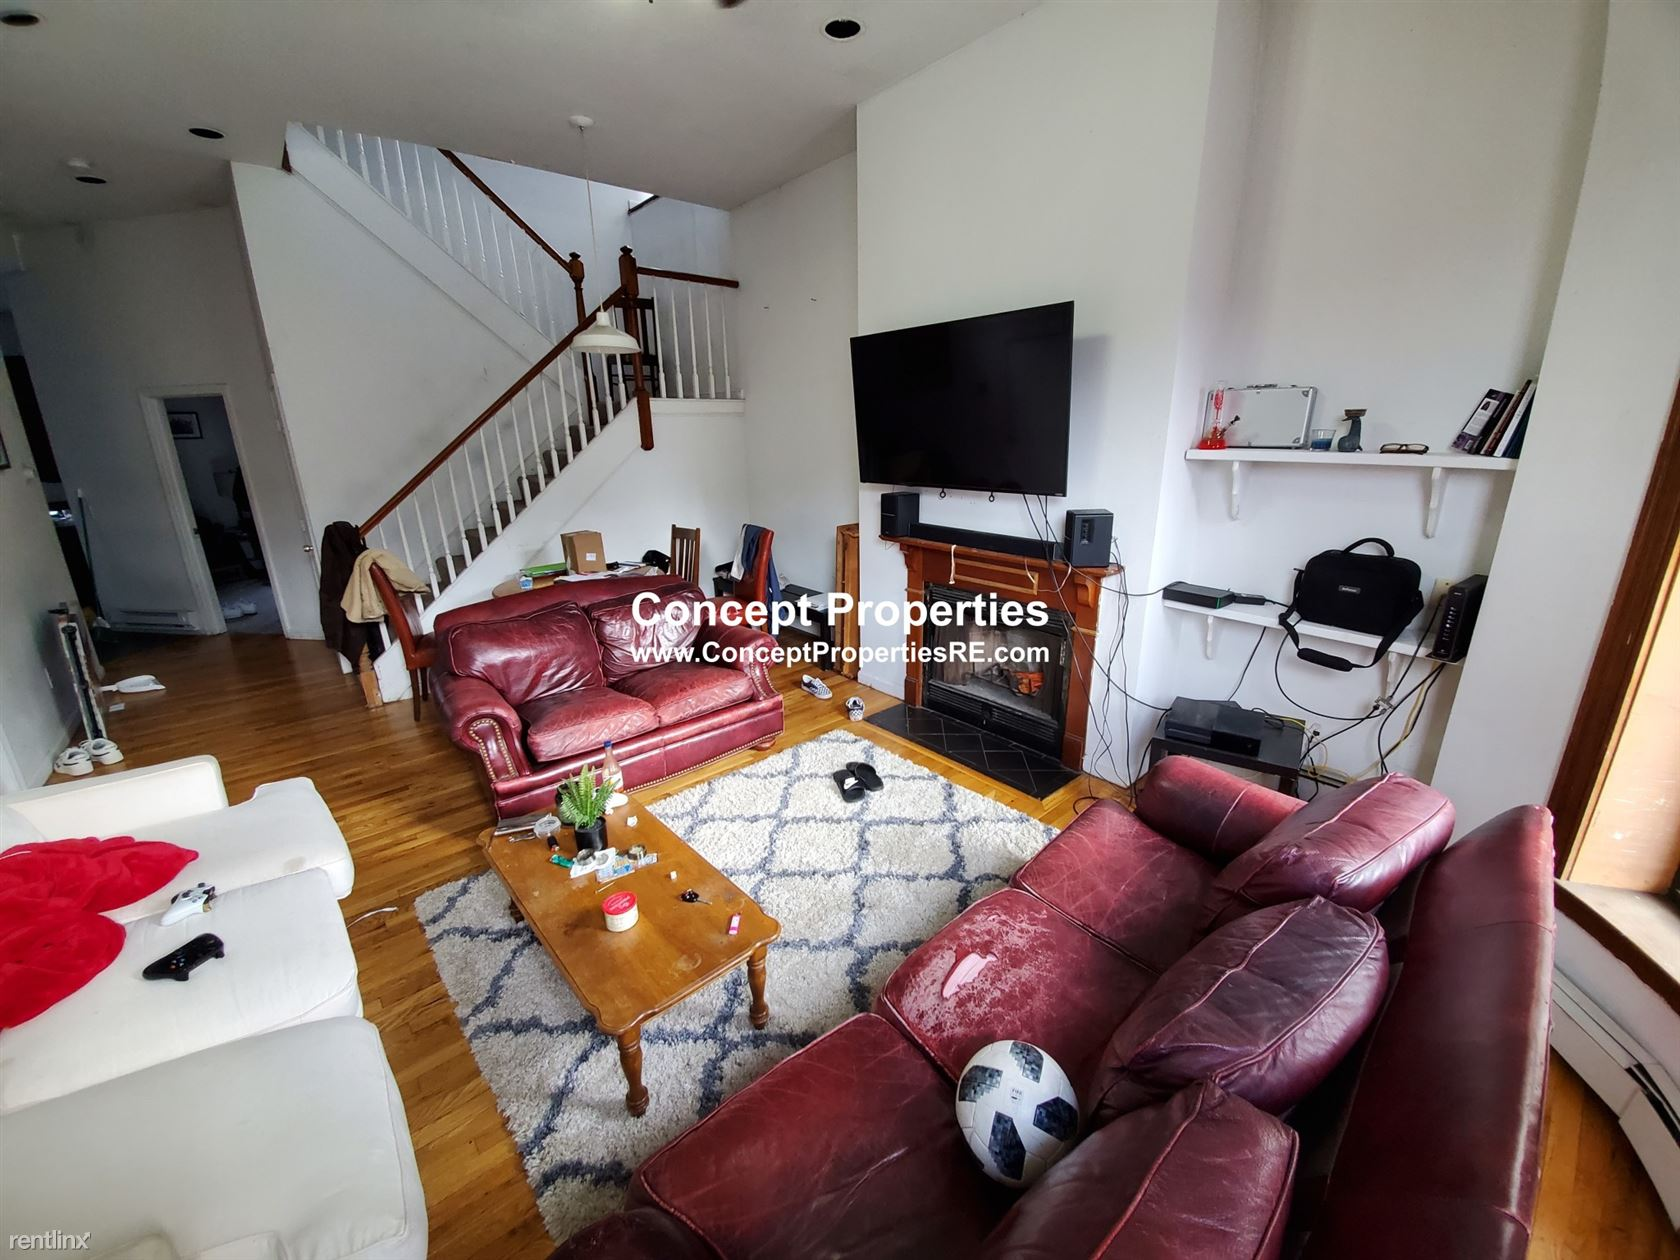 486 Massachusetts Ave Apt 2, Boston, MA - $6,000